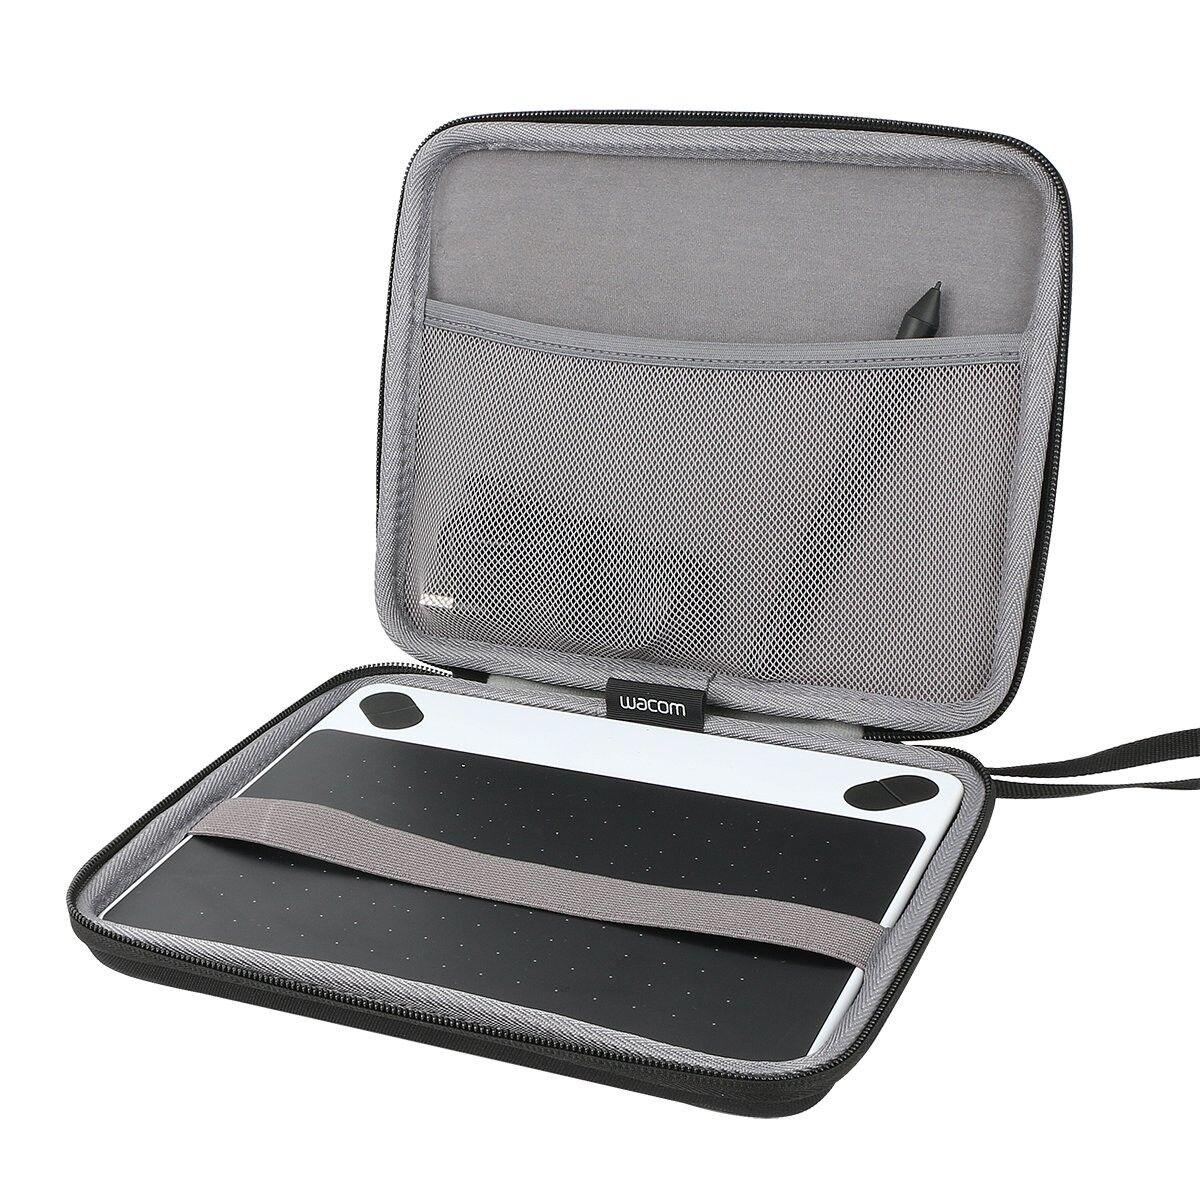 wacom intuos graphics tablet hard case fits